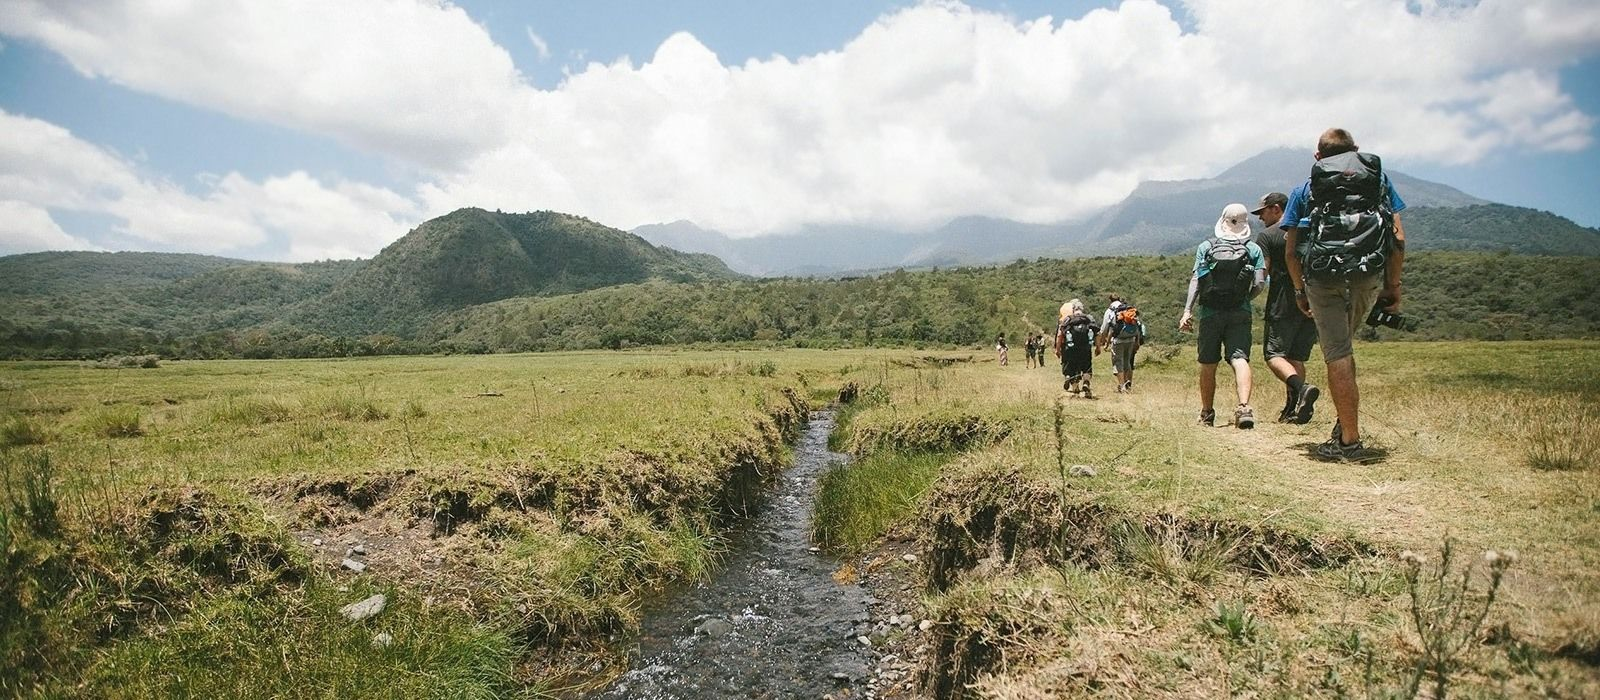 Tansania: Safari & authentische Einblicke Urlaub 2